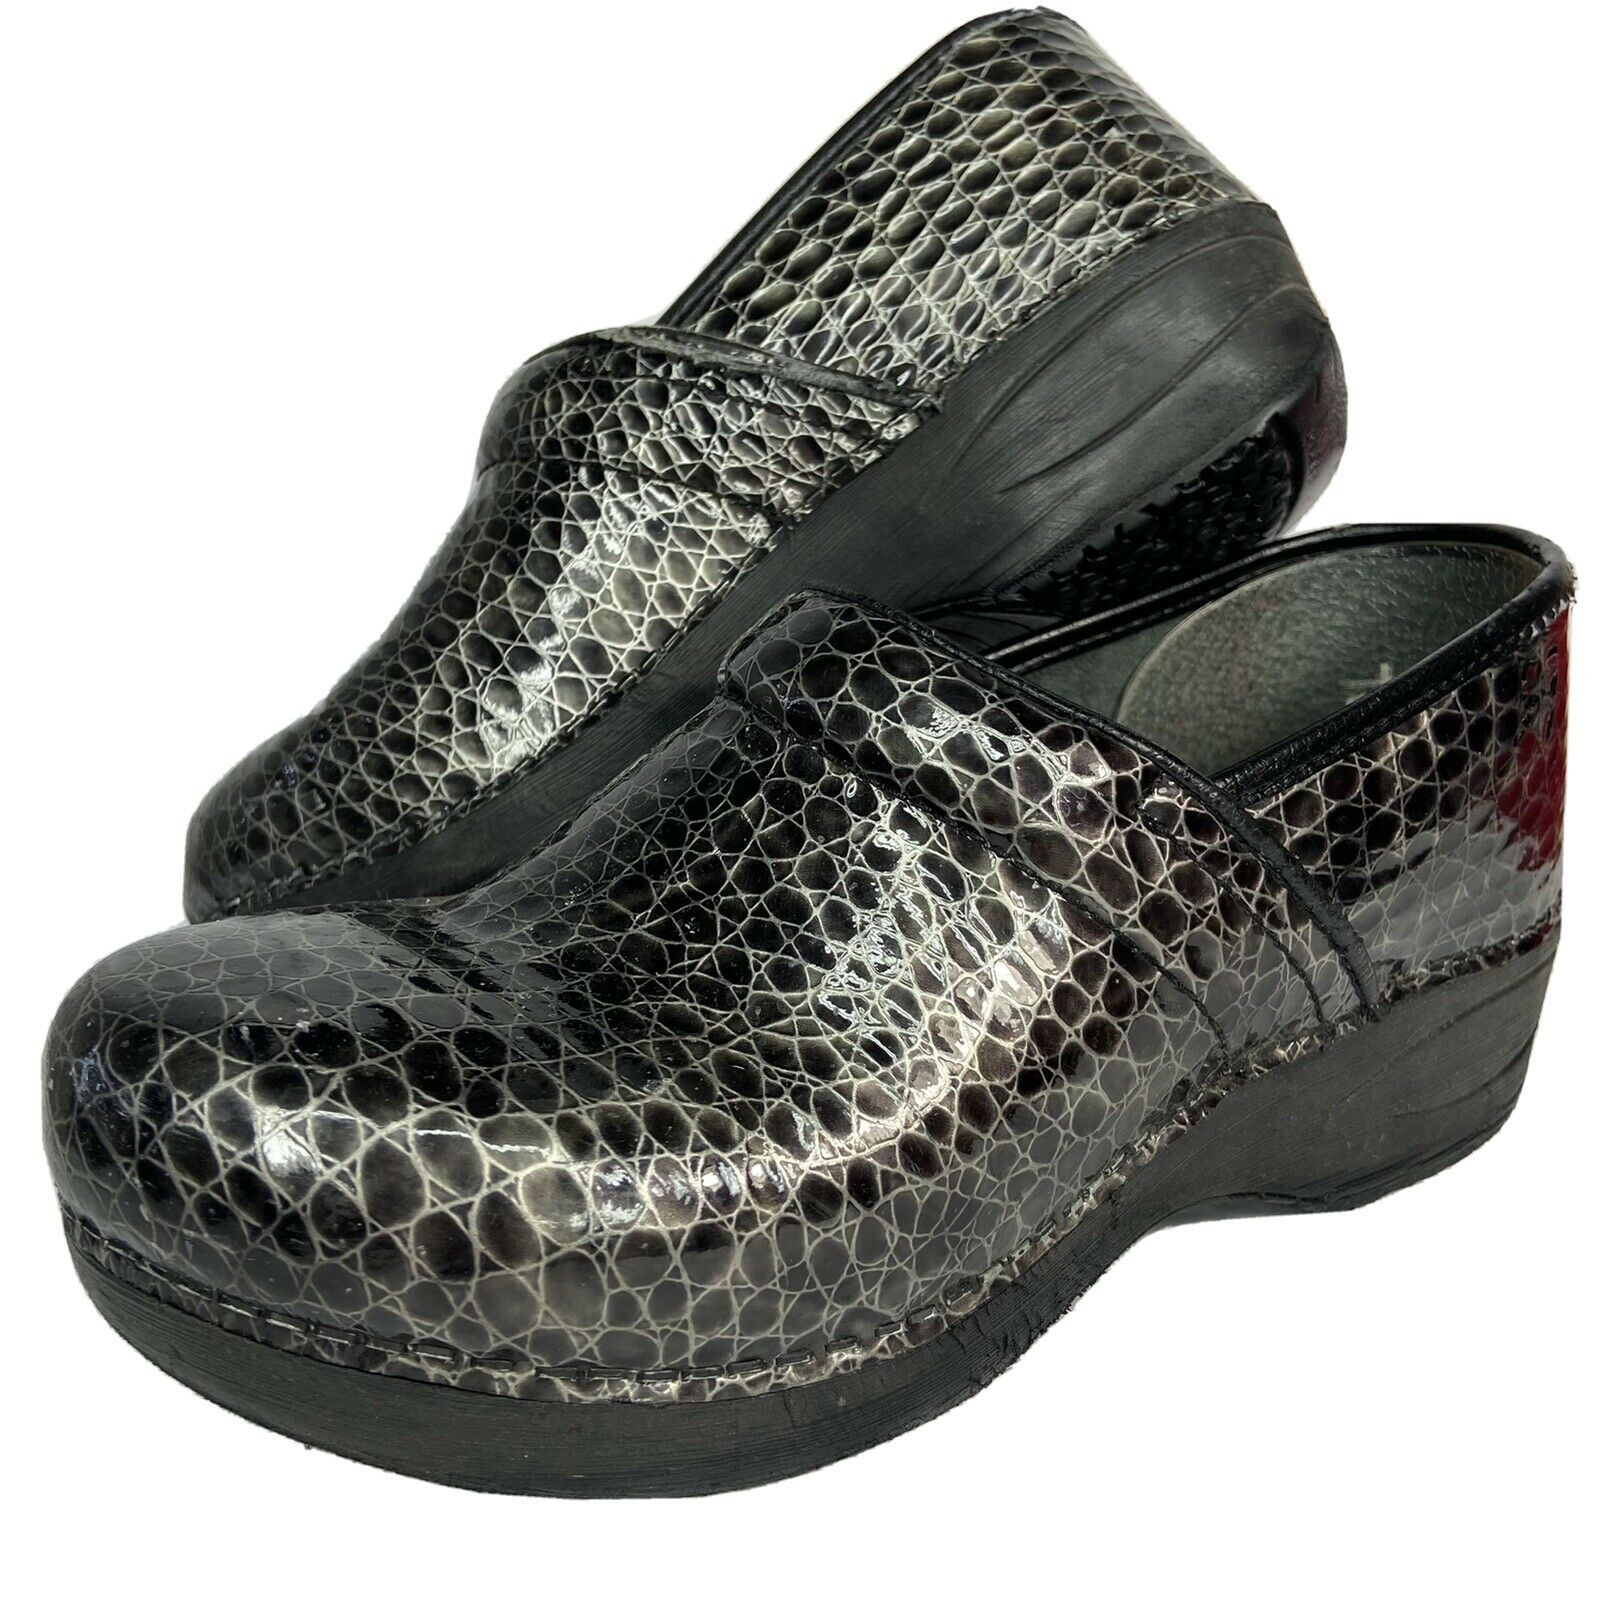 Dansko Pro XP 2.0 Womens Professional Clogs Black Grey Reptile Size 38